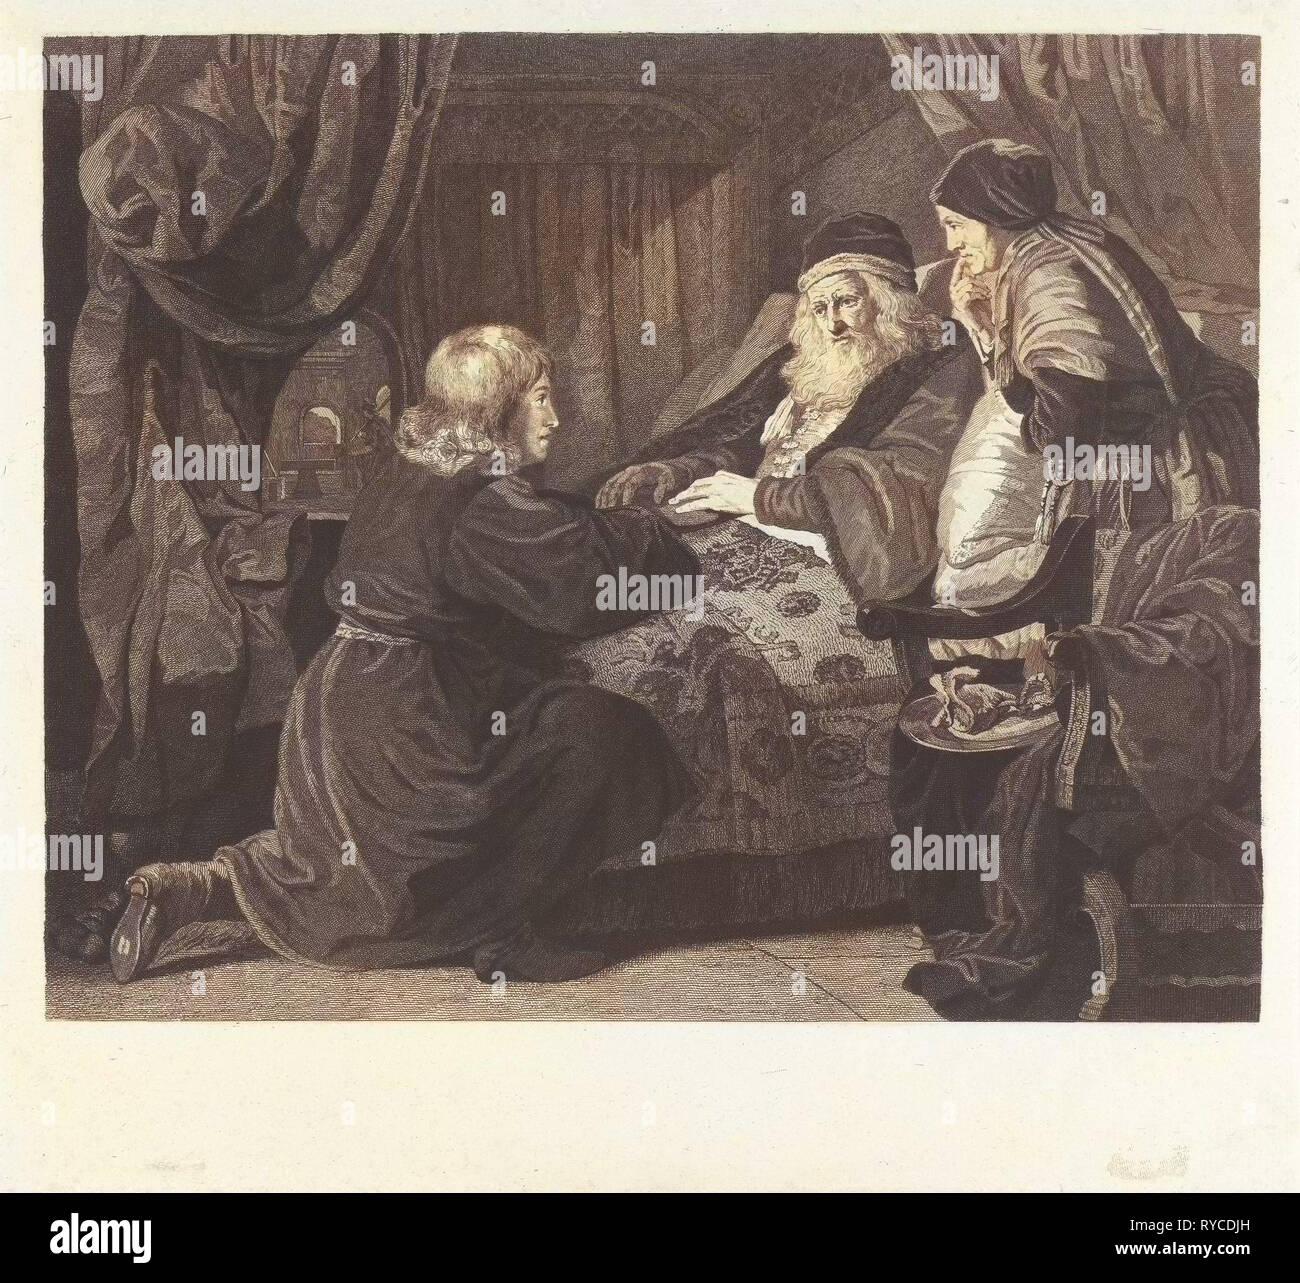 Isaac blesses Jacob, Lambertus Antonius Claessens, Le fort, Philips Koninck, c. 1829 - 1834 - Stock Image